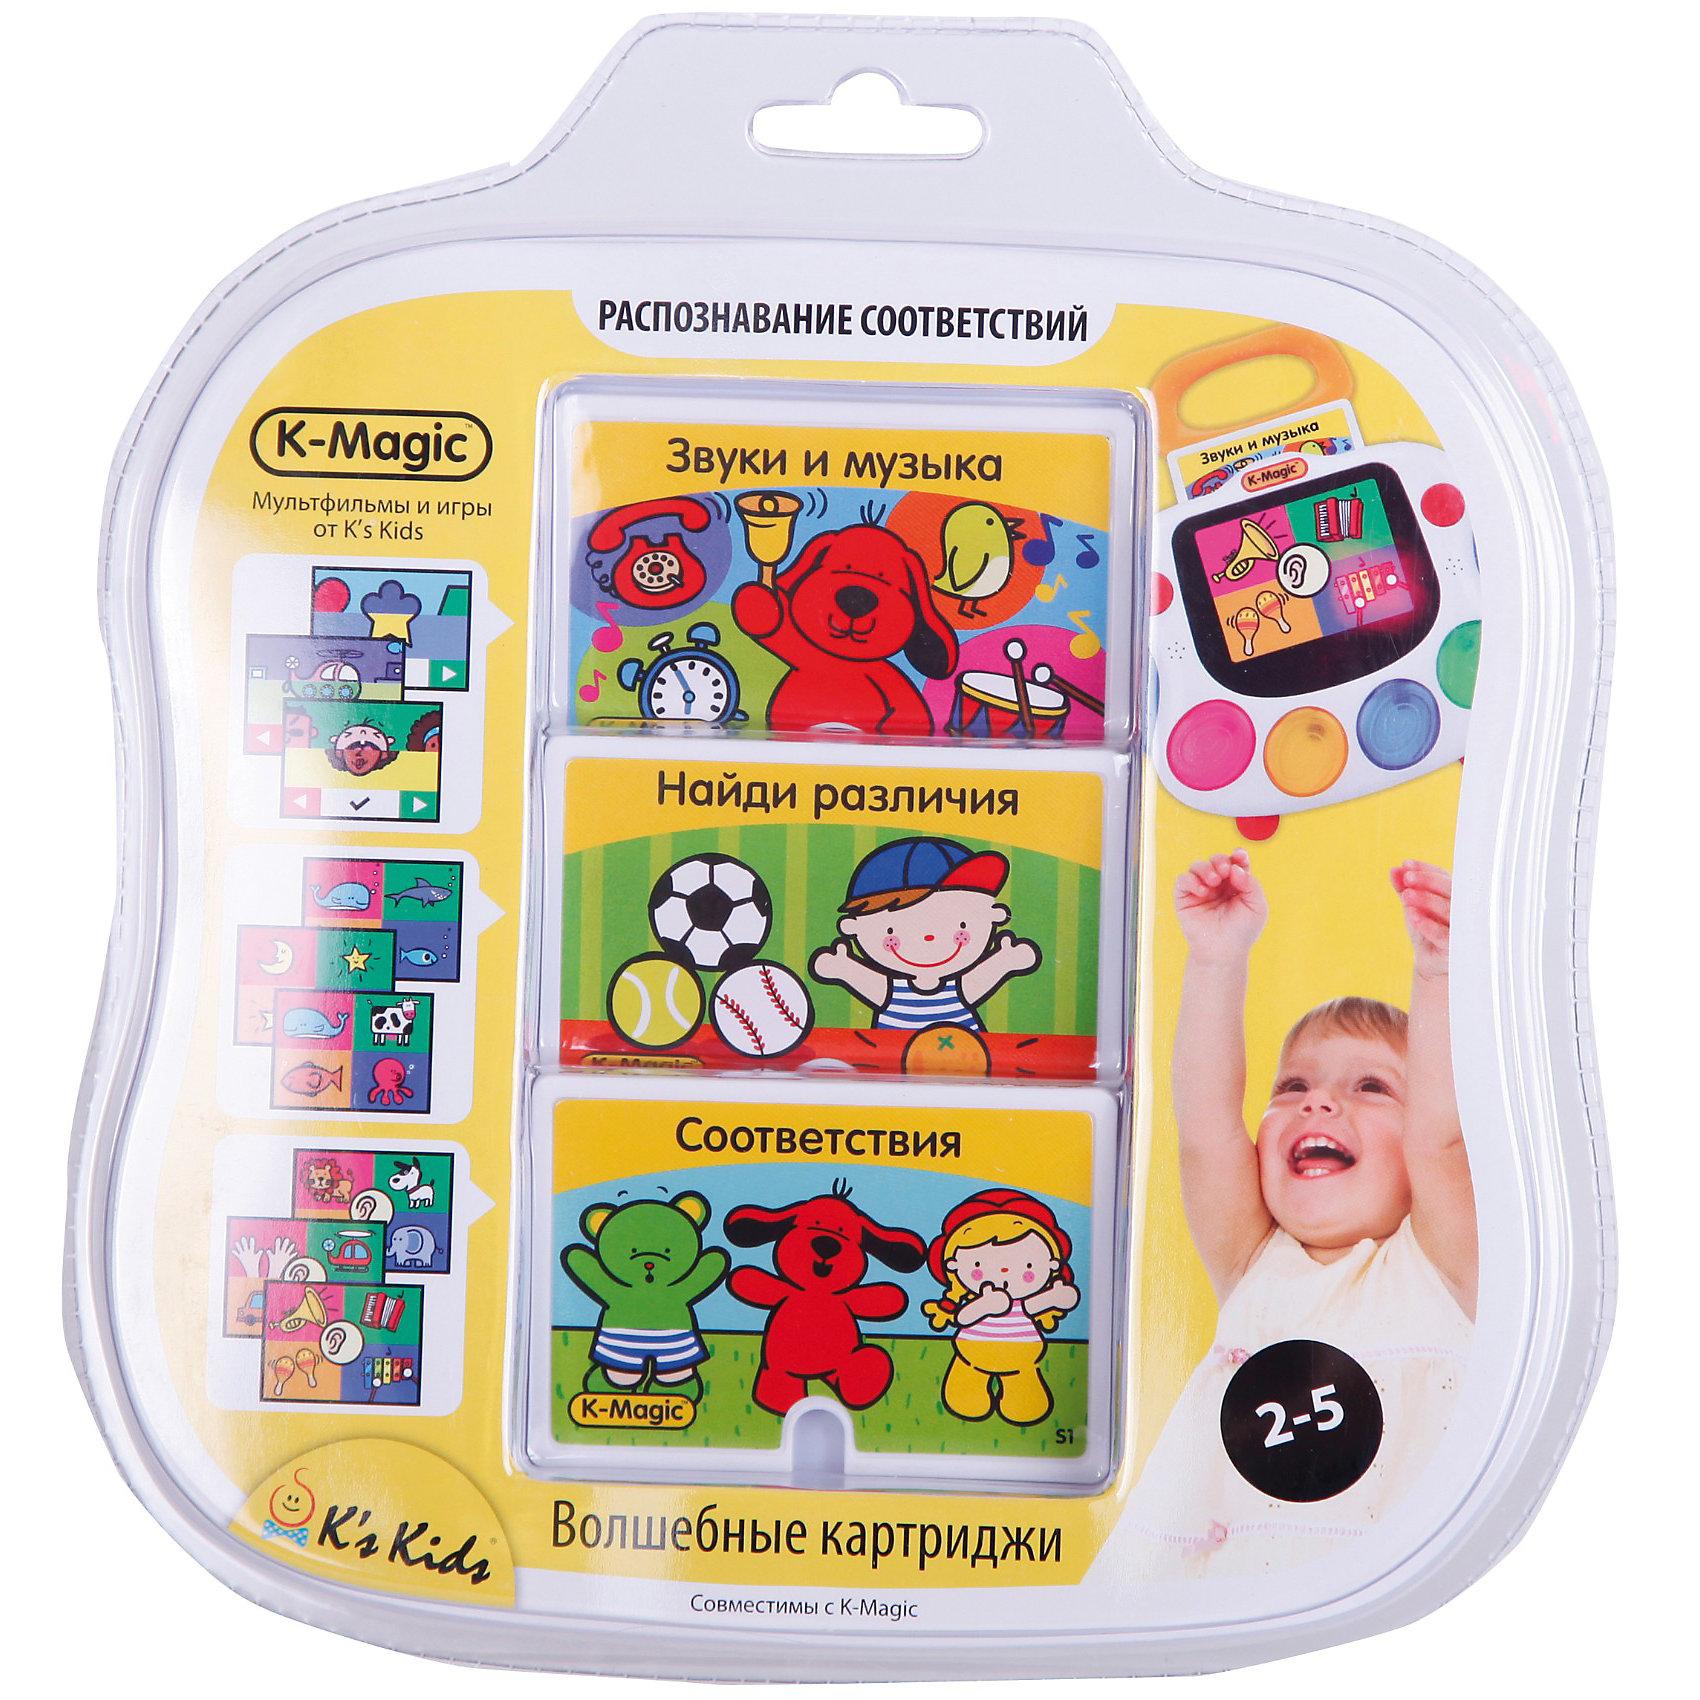 K's Kids Набор картриджей K-Magic Распознавание соответствий, K's Kids набор картриджей k magic логическое мышление ка 10564